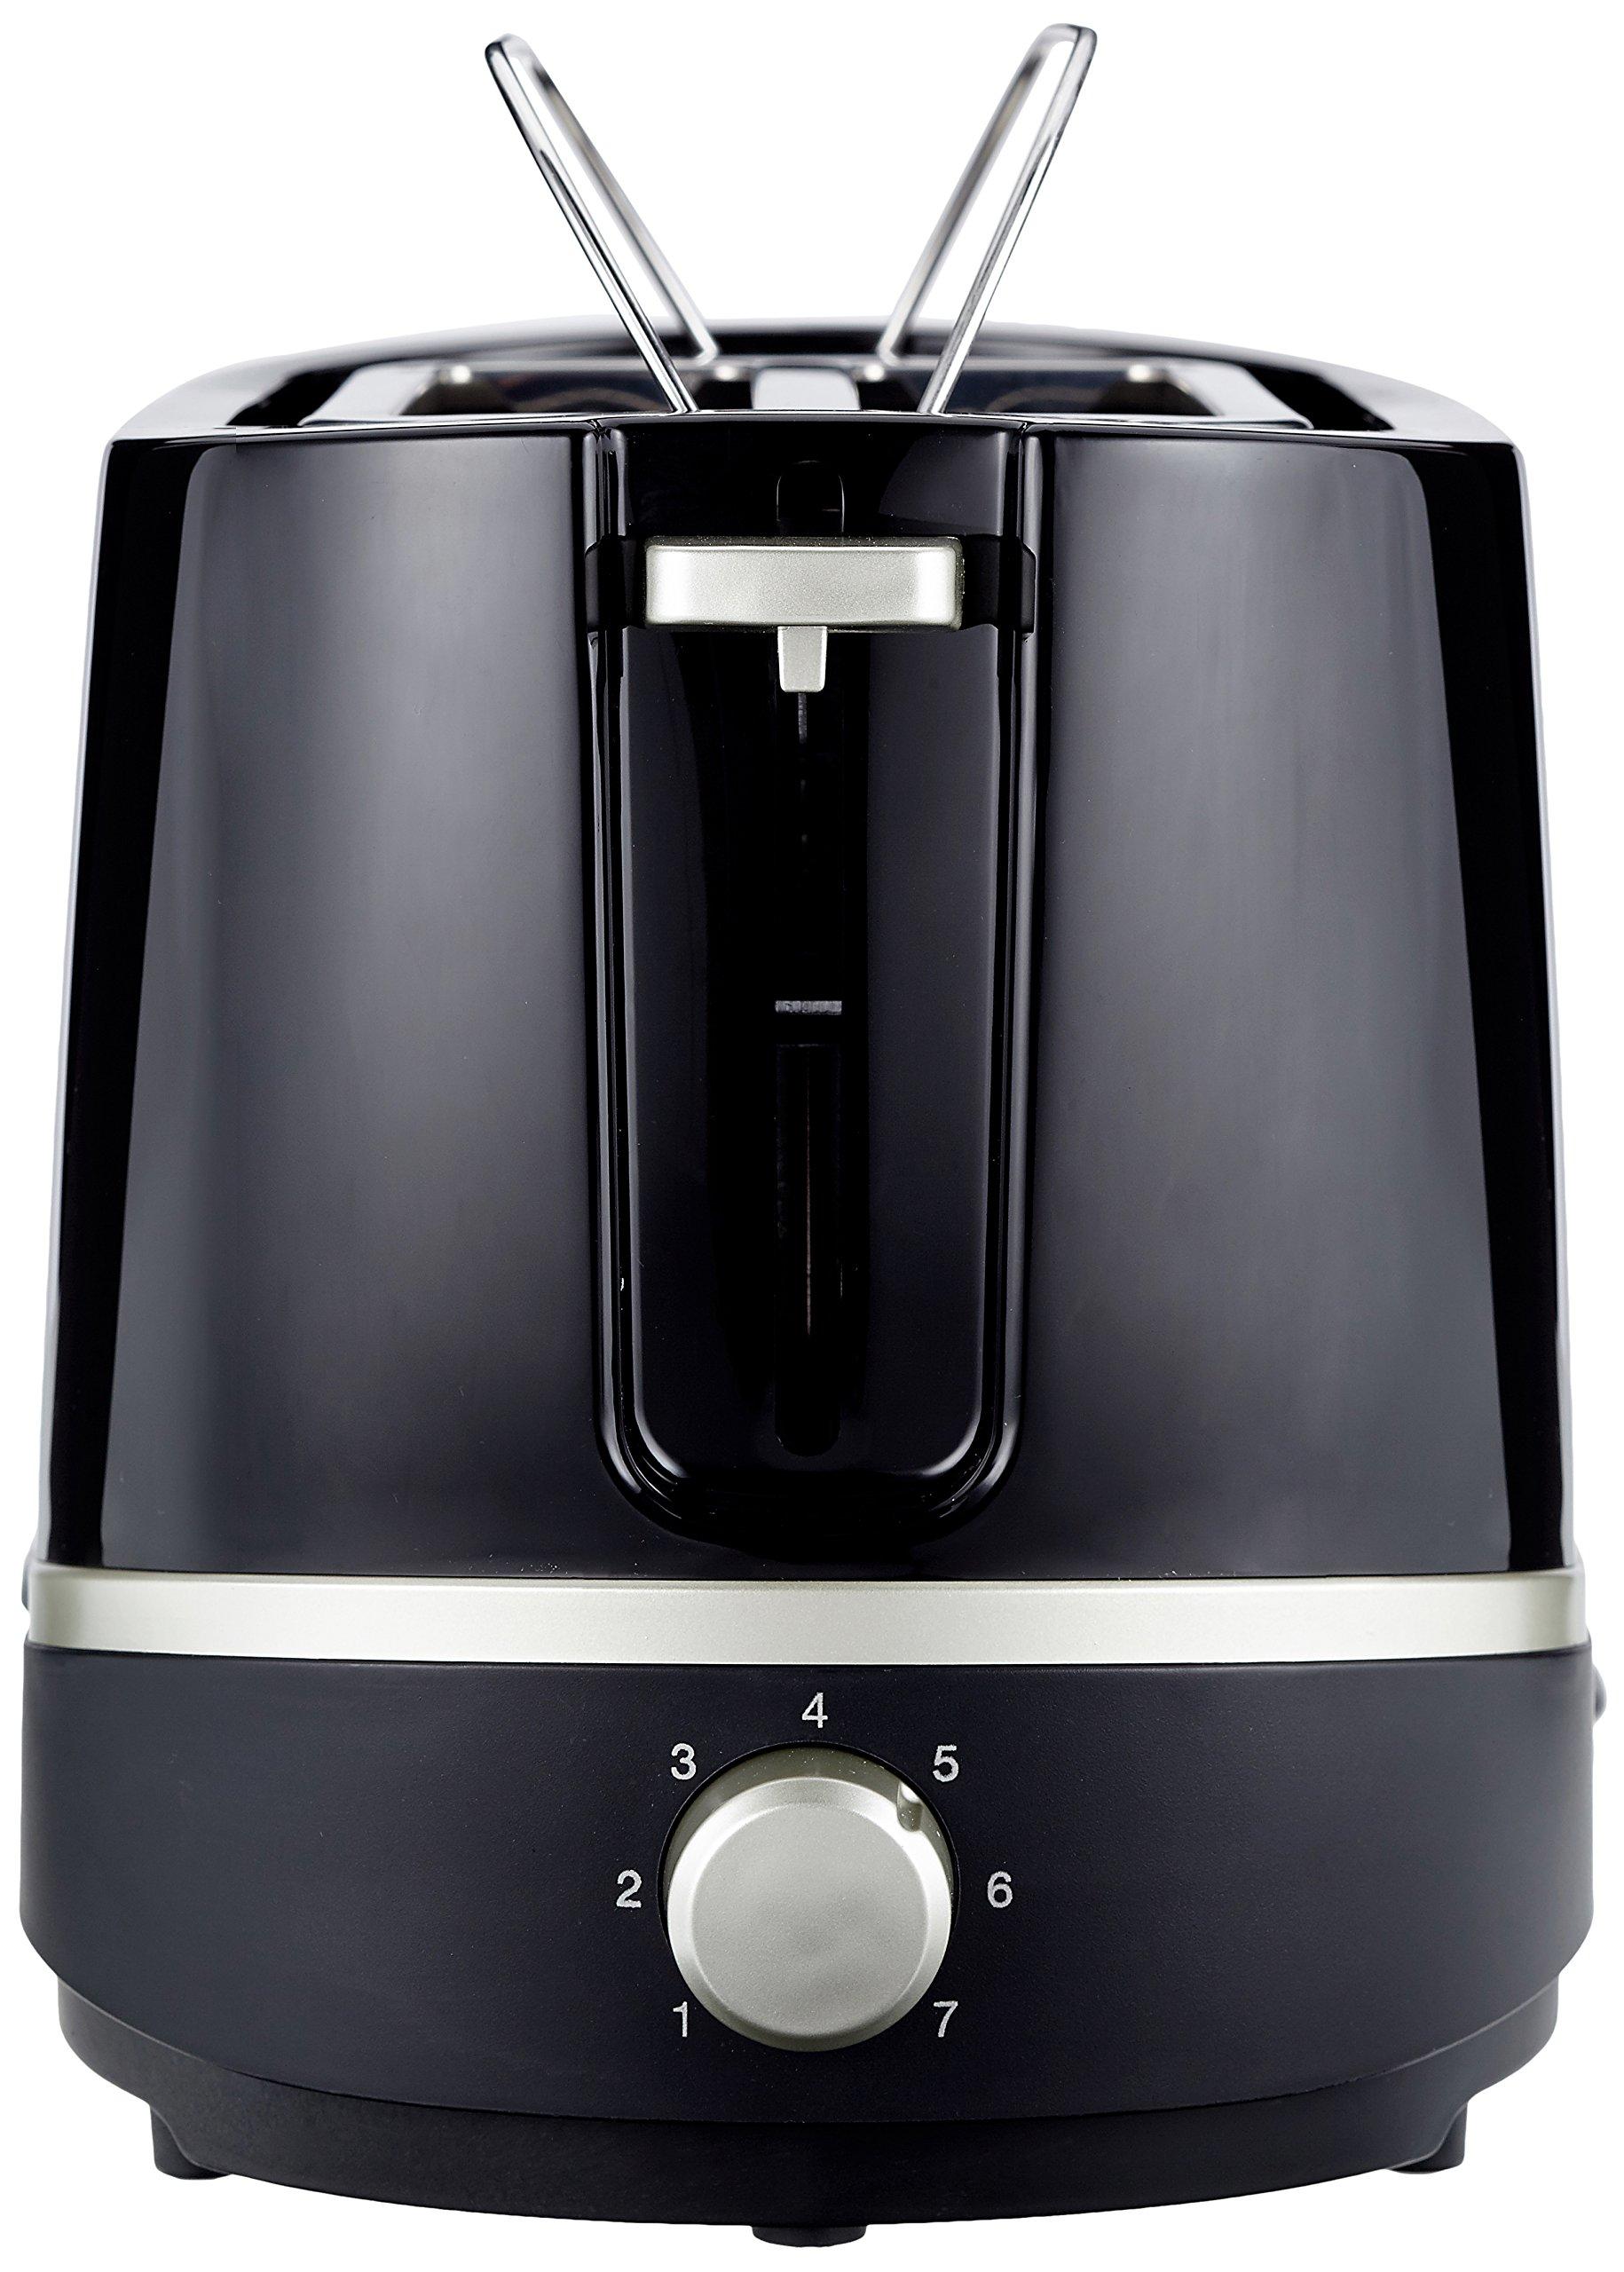 AmazonBasics-Doppelschlitz-Toaster-Leistung-800-W-Schwarz